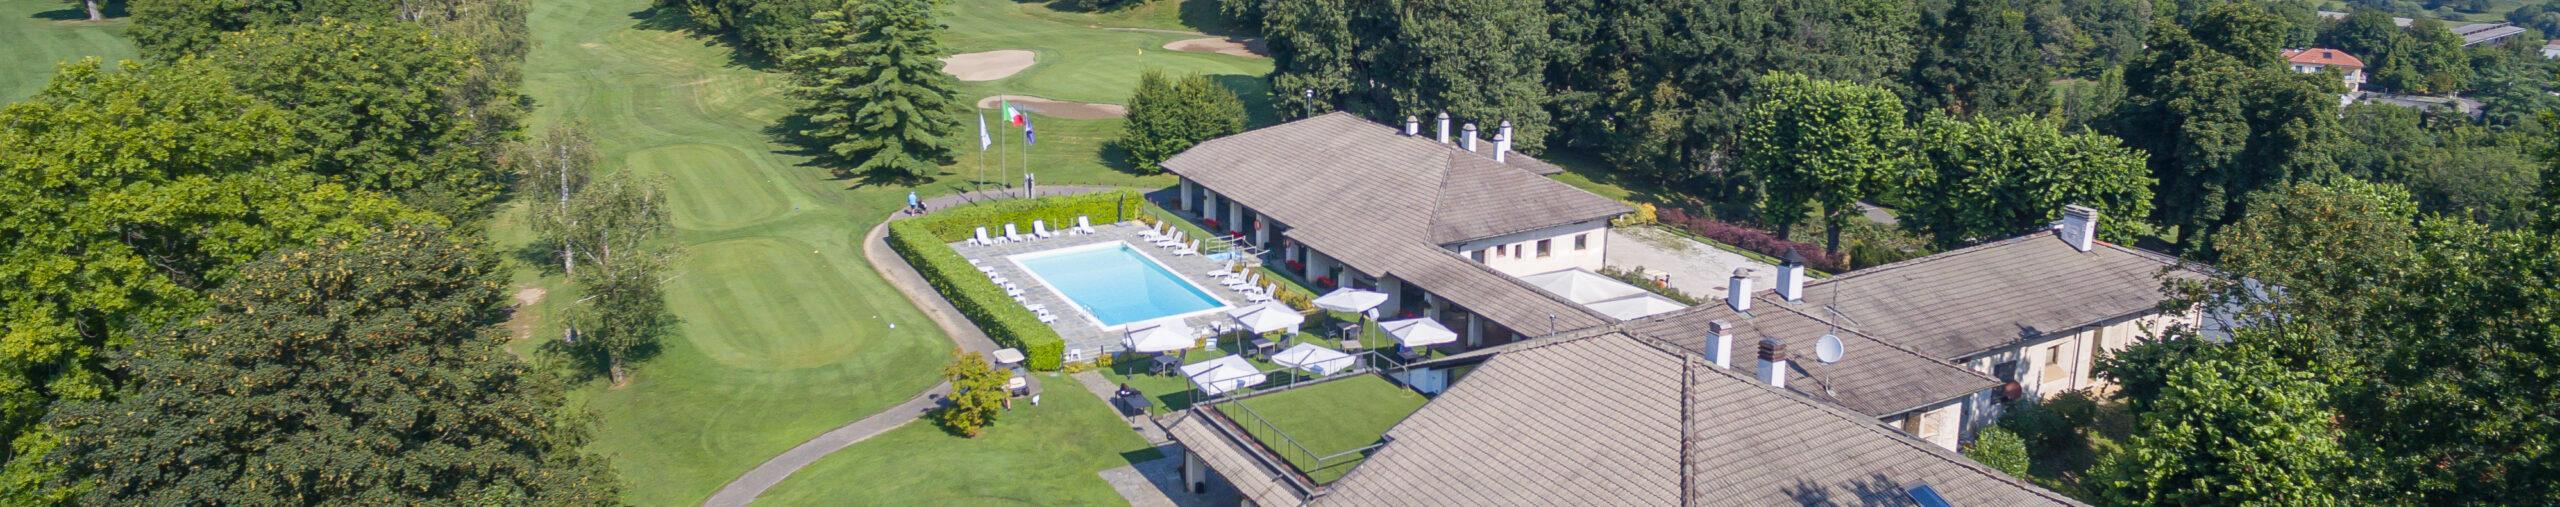 vue sur le golf le fronde Avigliana Turin